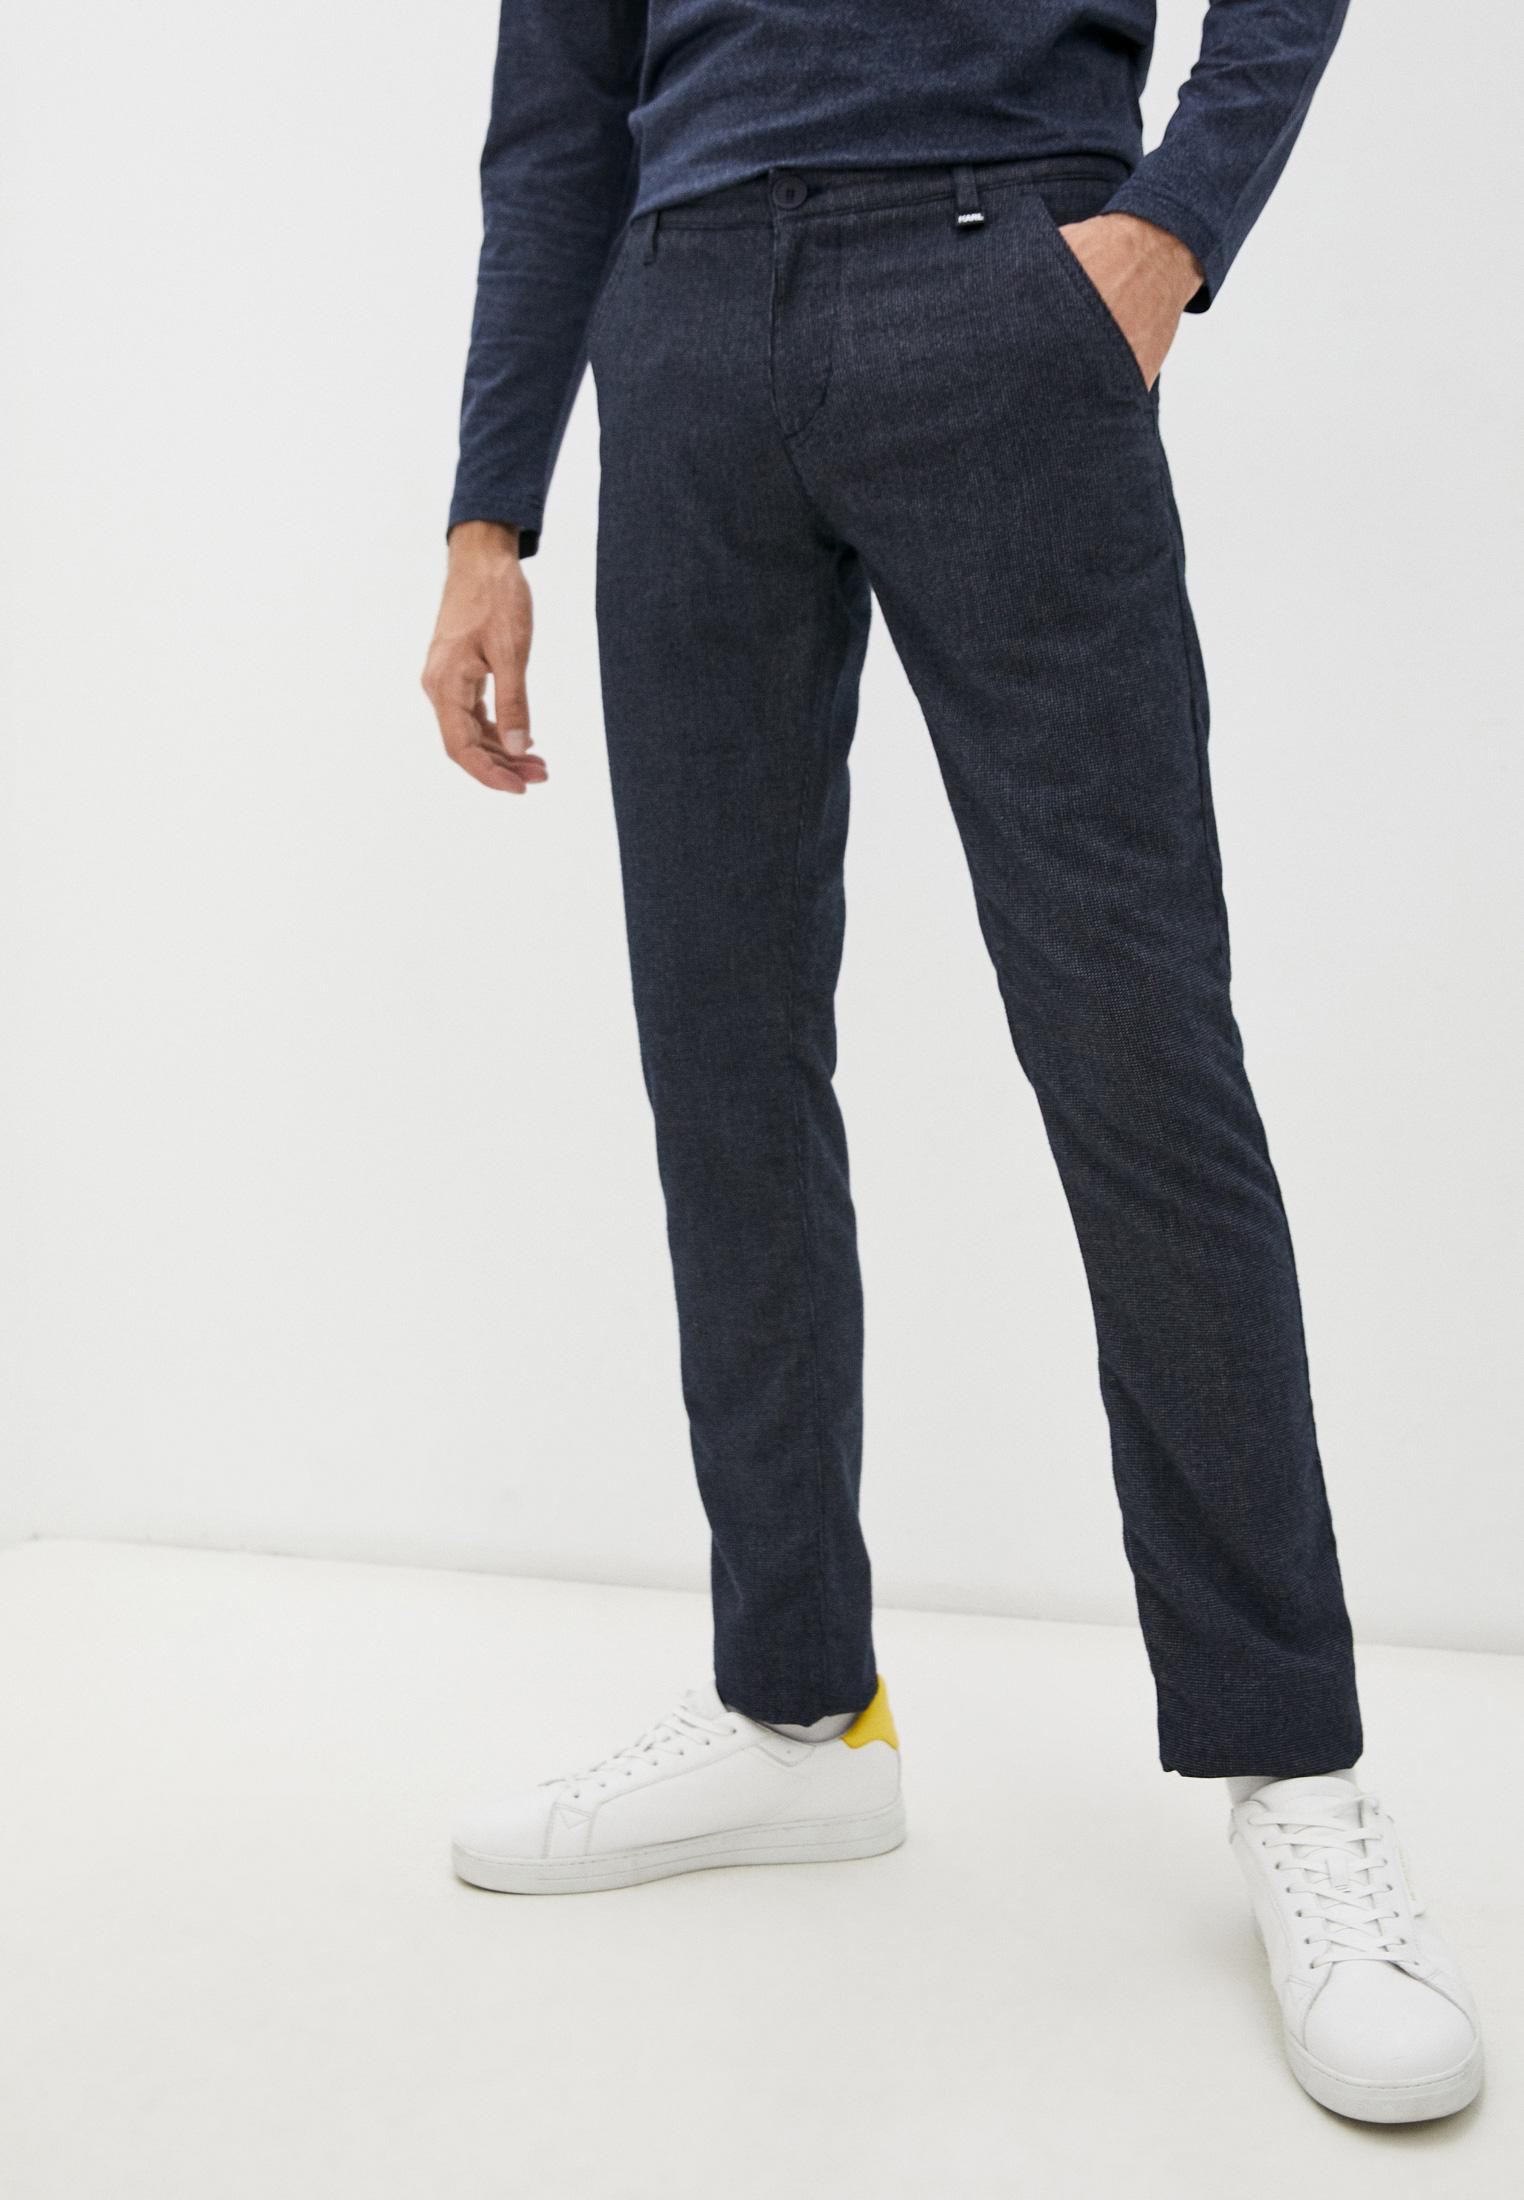 Мужские брюки Karl Lagerfeld 512805-255835